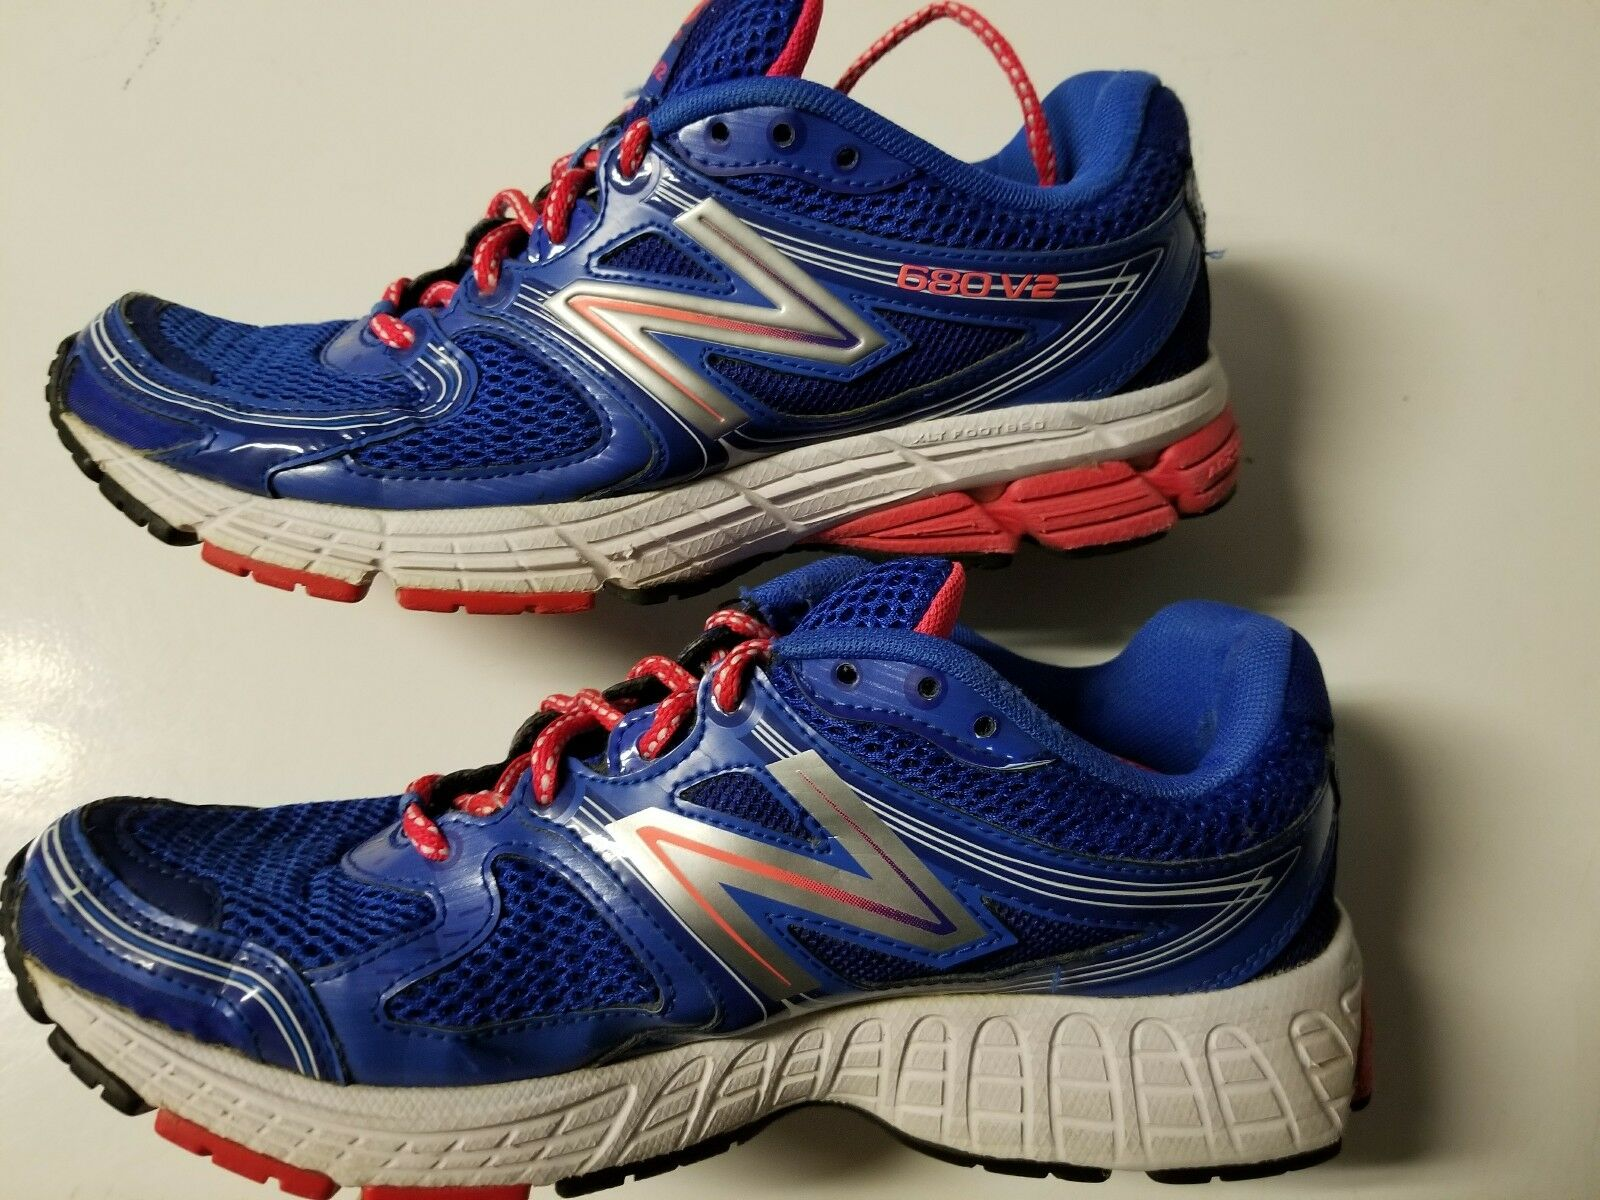 NEW BALANCE 680v2 WOMEN'S blueE TRAIL RUNNING SHOES sz 8,  W680BB2